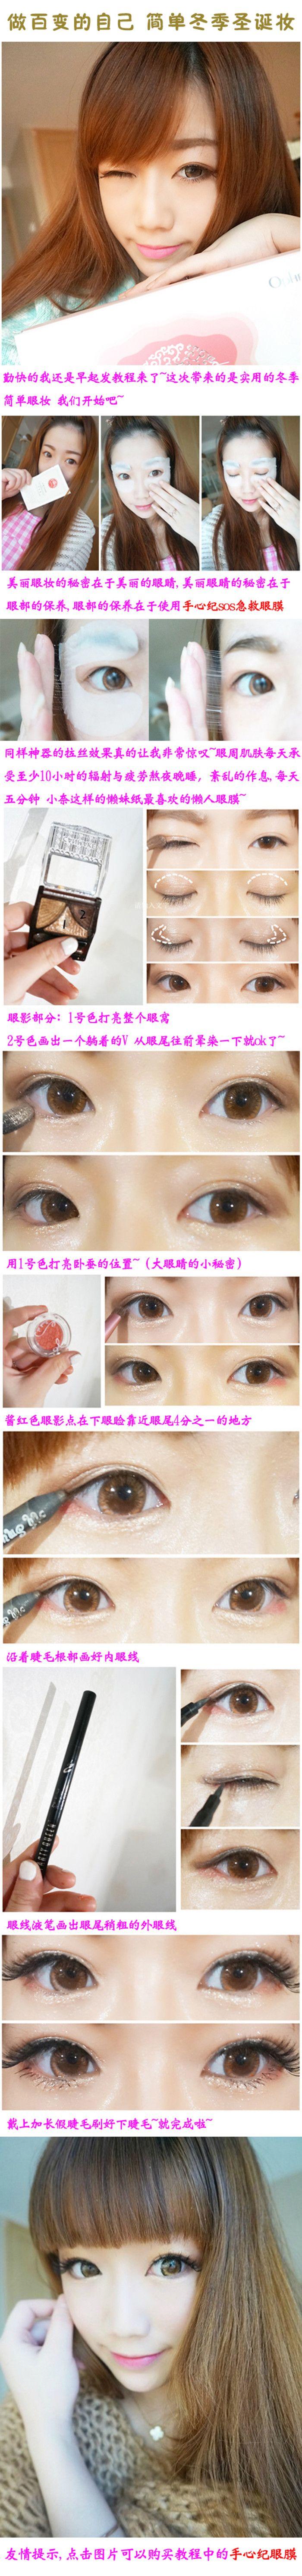 Asian makeup tutorial, a pink undereye highlight is super trendy right now     ⭐️⭐️   #JoinNerium #DebbieKrug #NeriumKorea #NeriumAsia ⭐www.SkincareInKorea.info️      www.AsianSkincare.Rocks  ⭐️